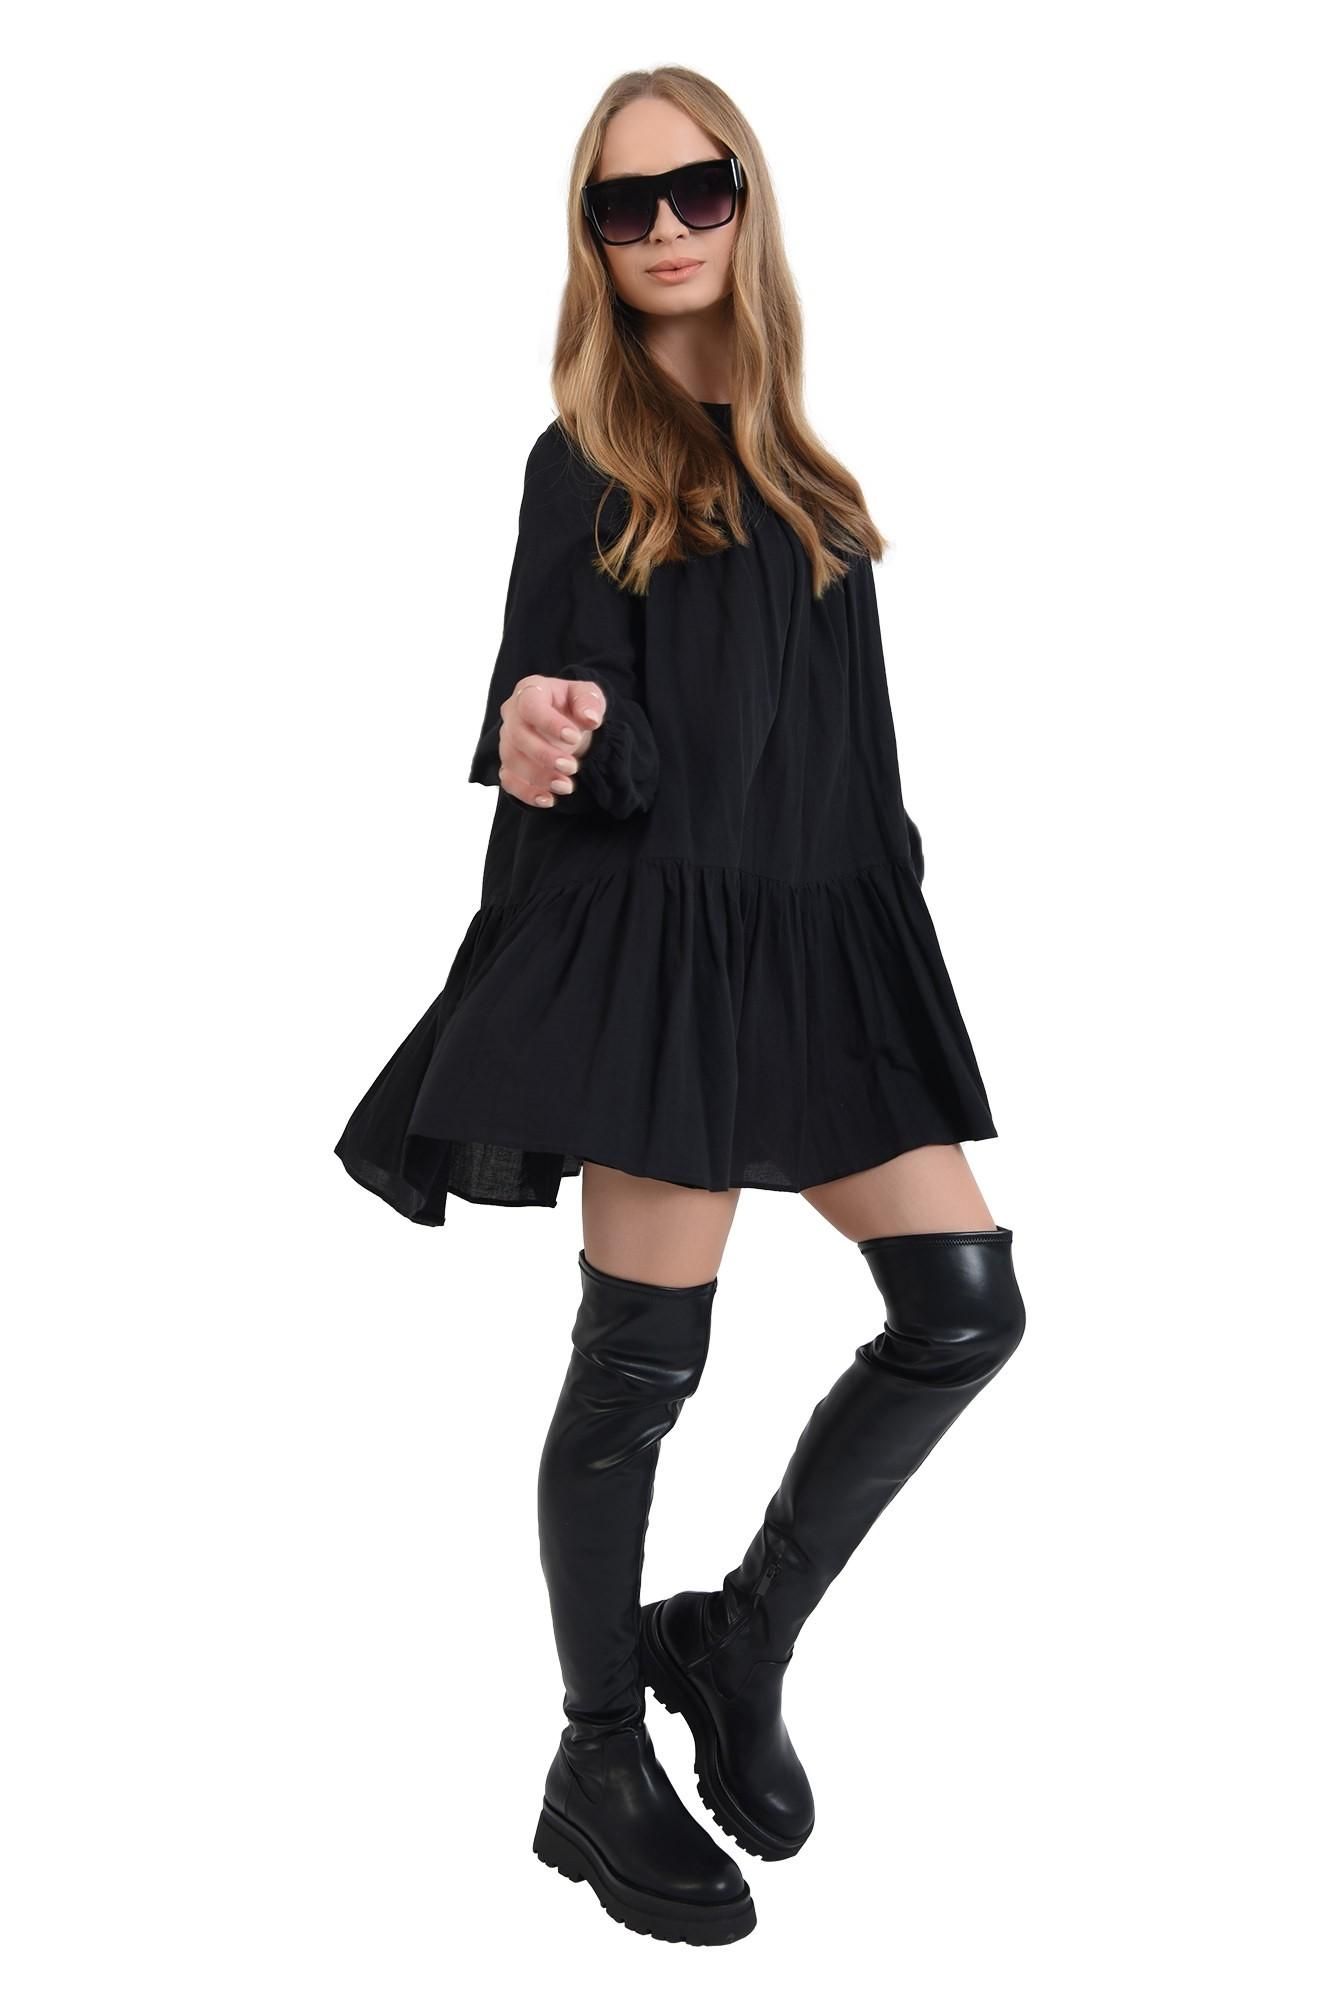 360 - rochie neagra scurta,cu maneca lunga Poema